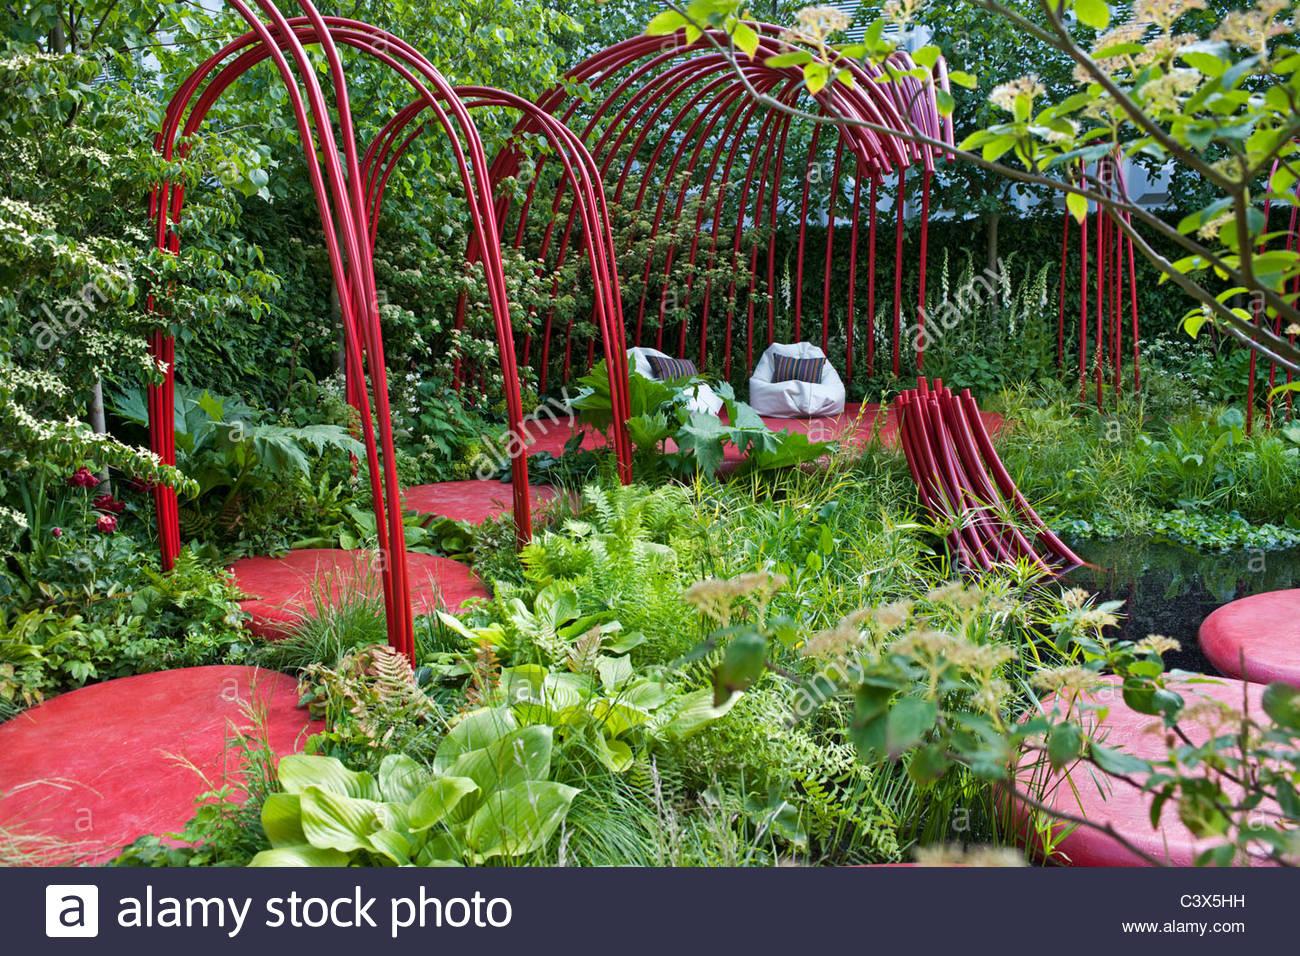 Superb British Heart Foundation Garden Designed By AnnMarie Powell Stock